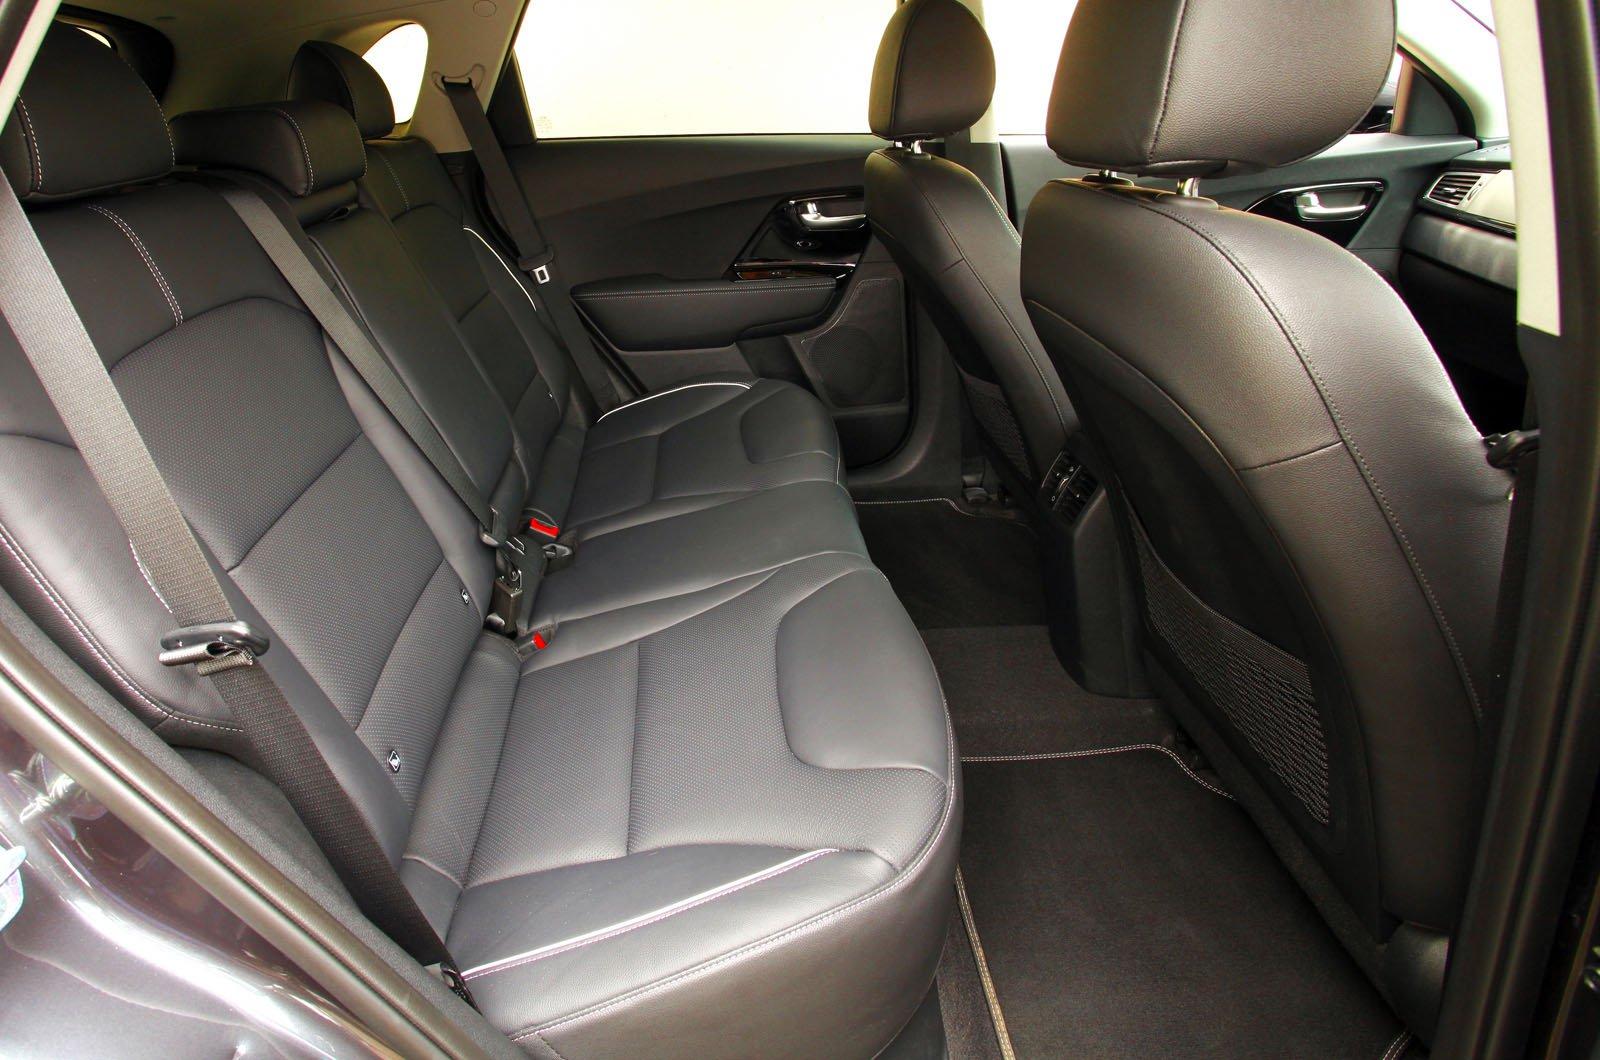 Kia e-Niro rear seats